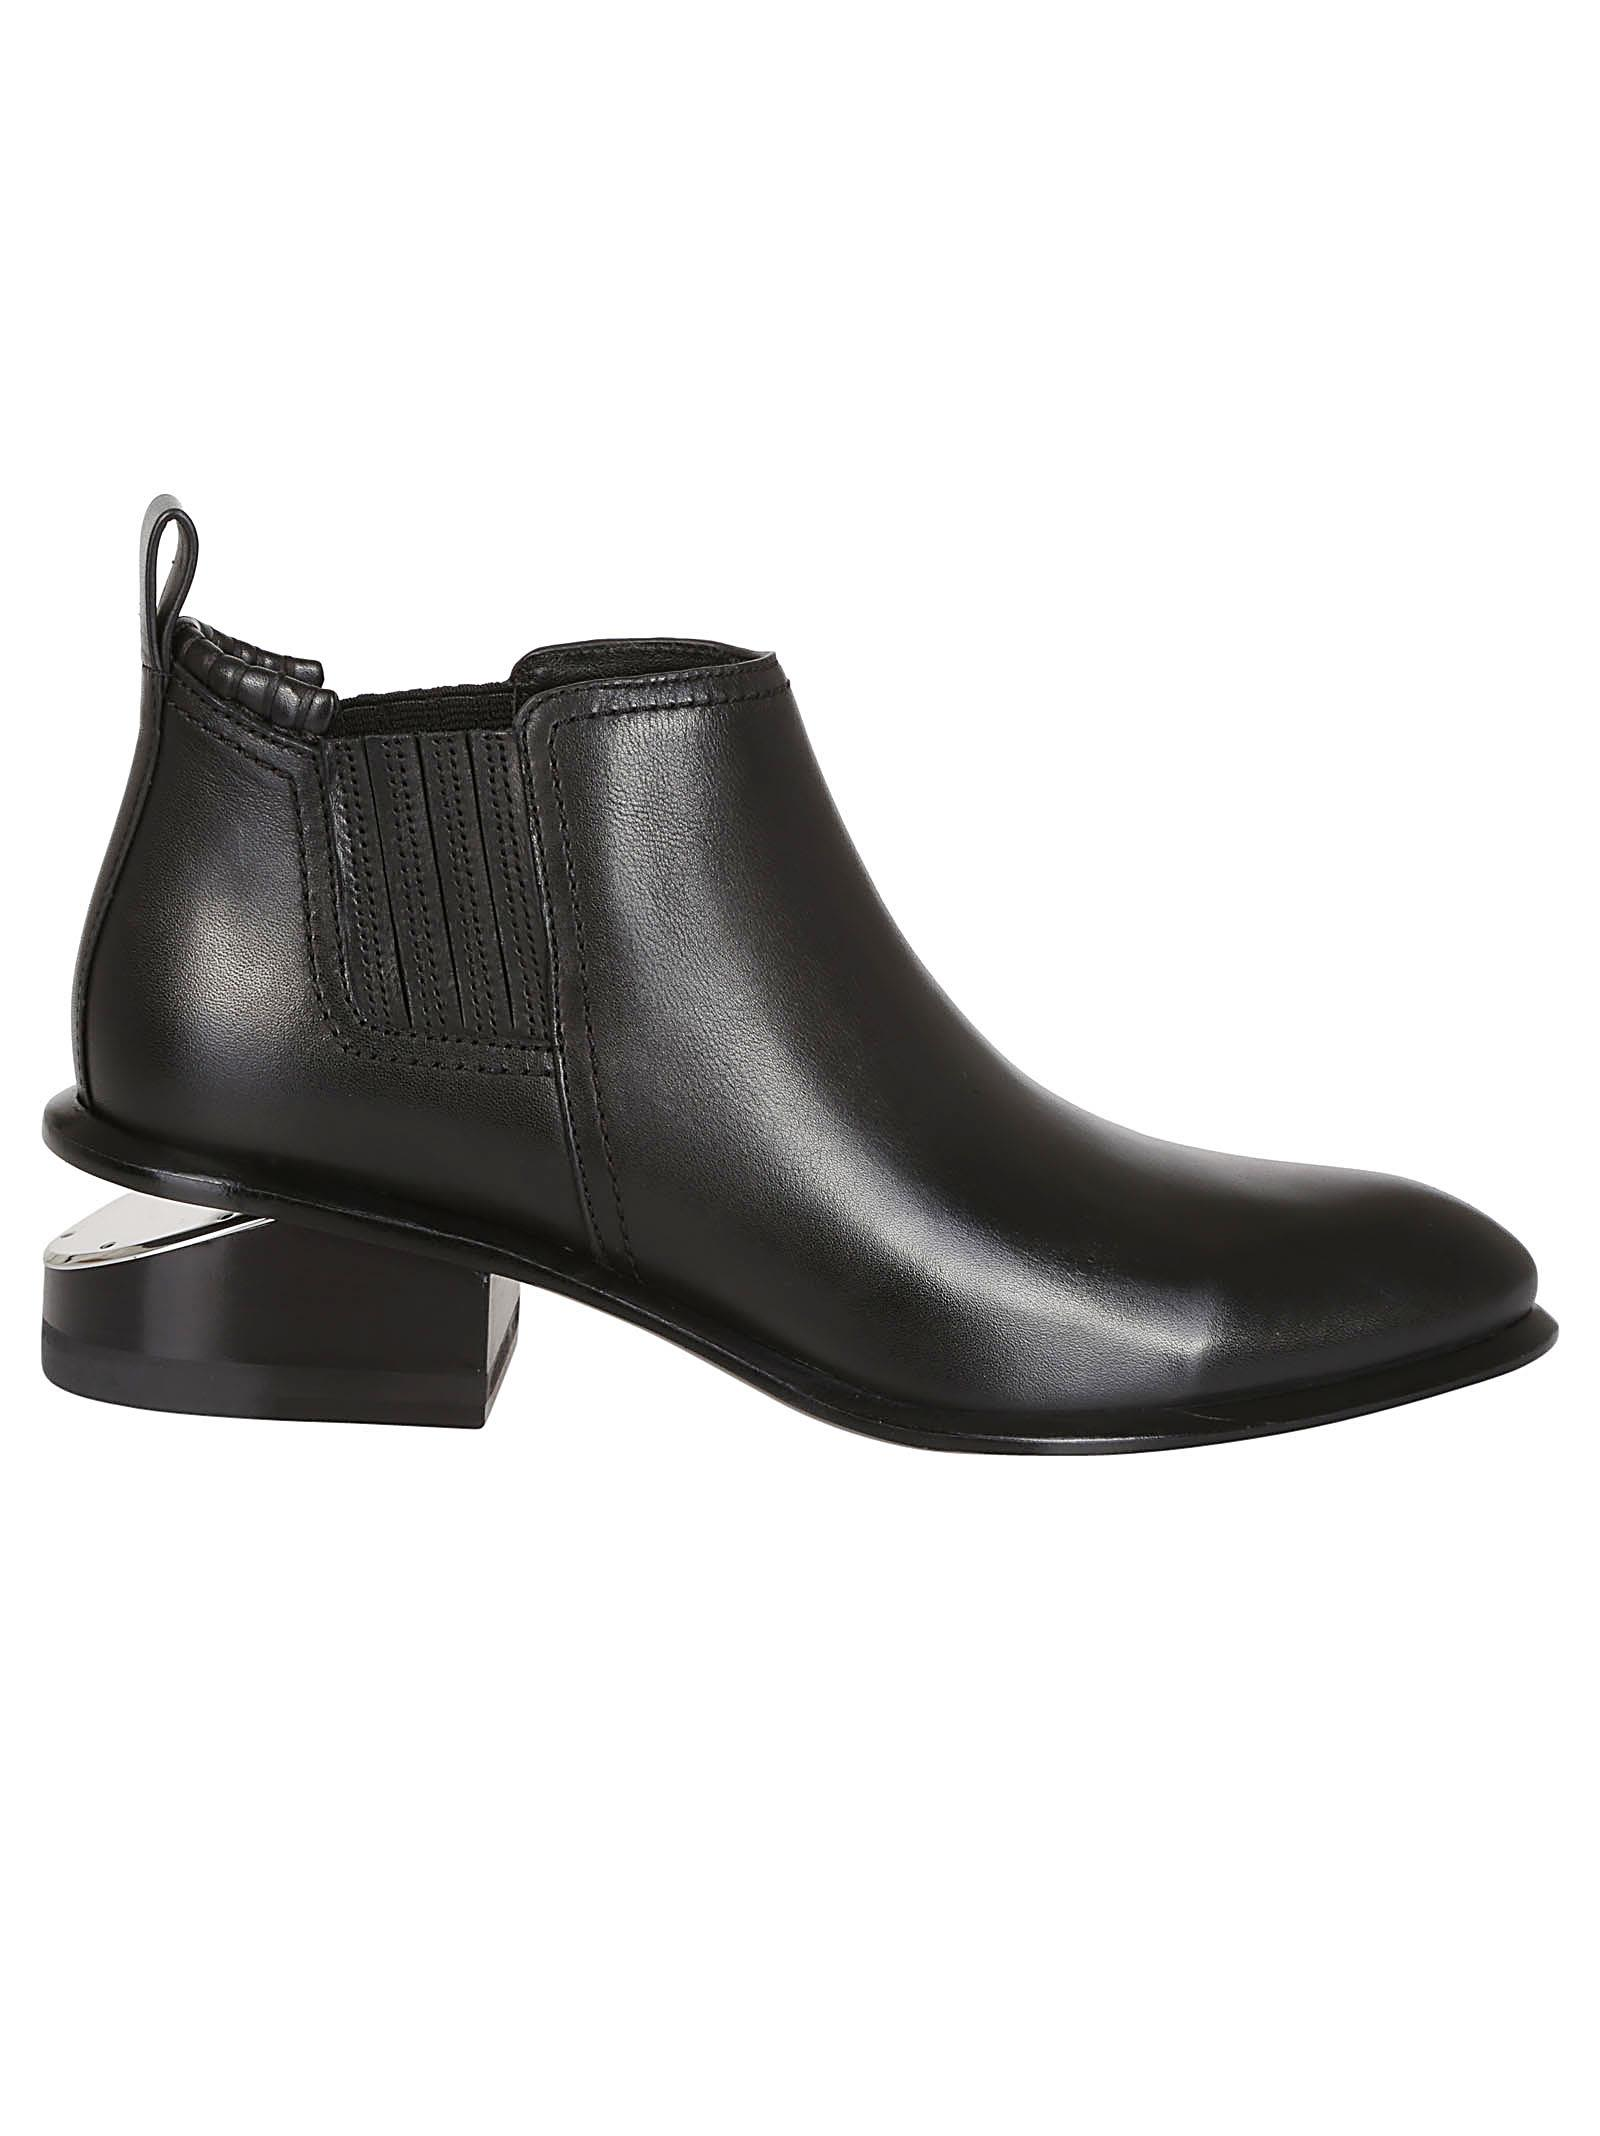 alexander wang -  Cut-out Heel Low Boots